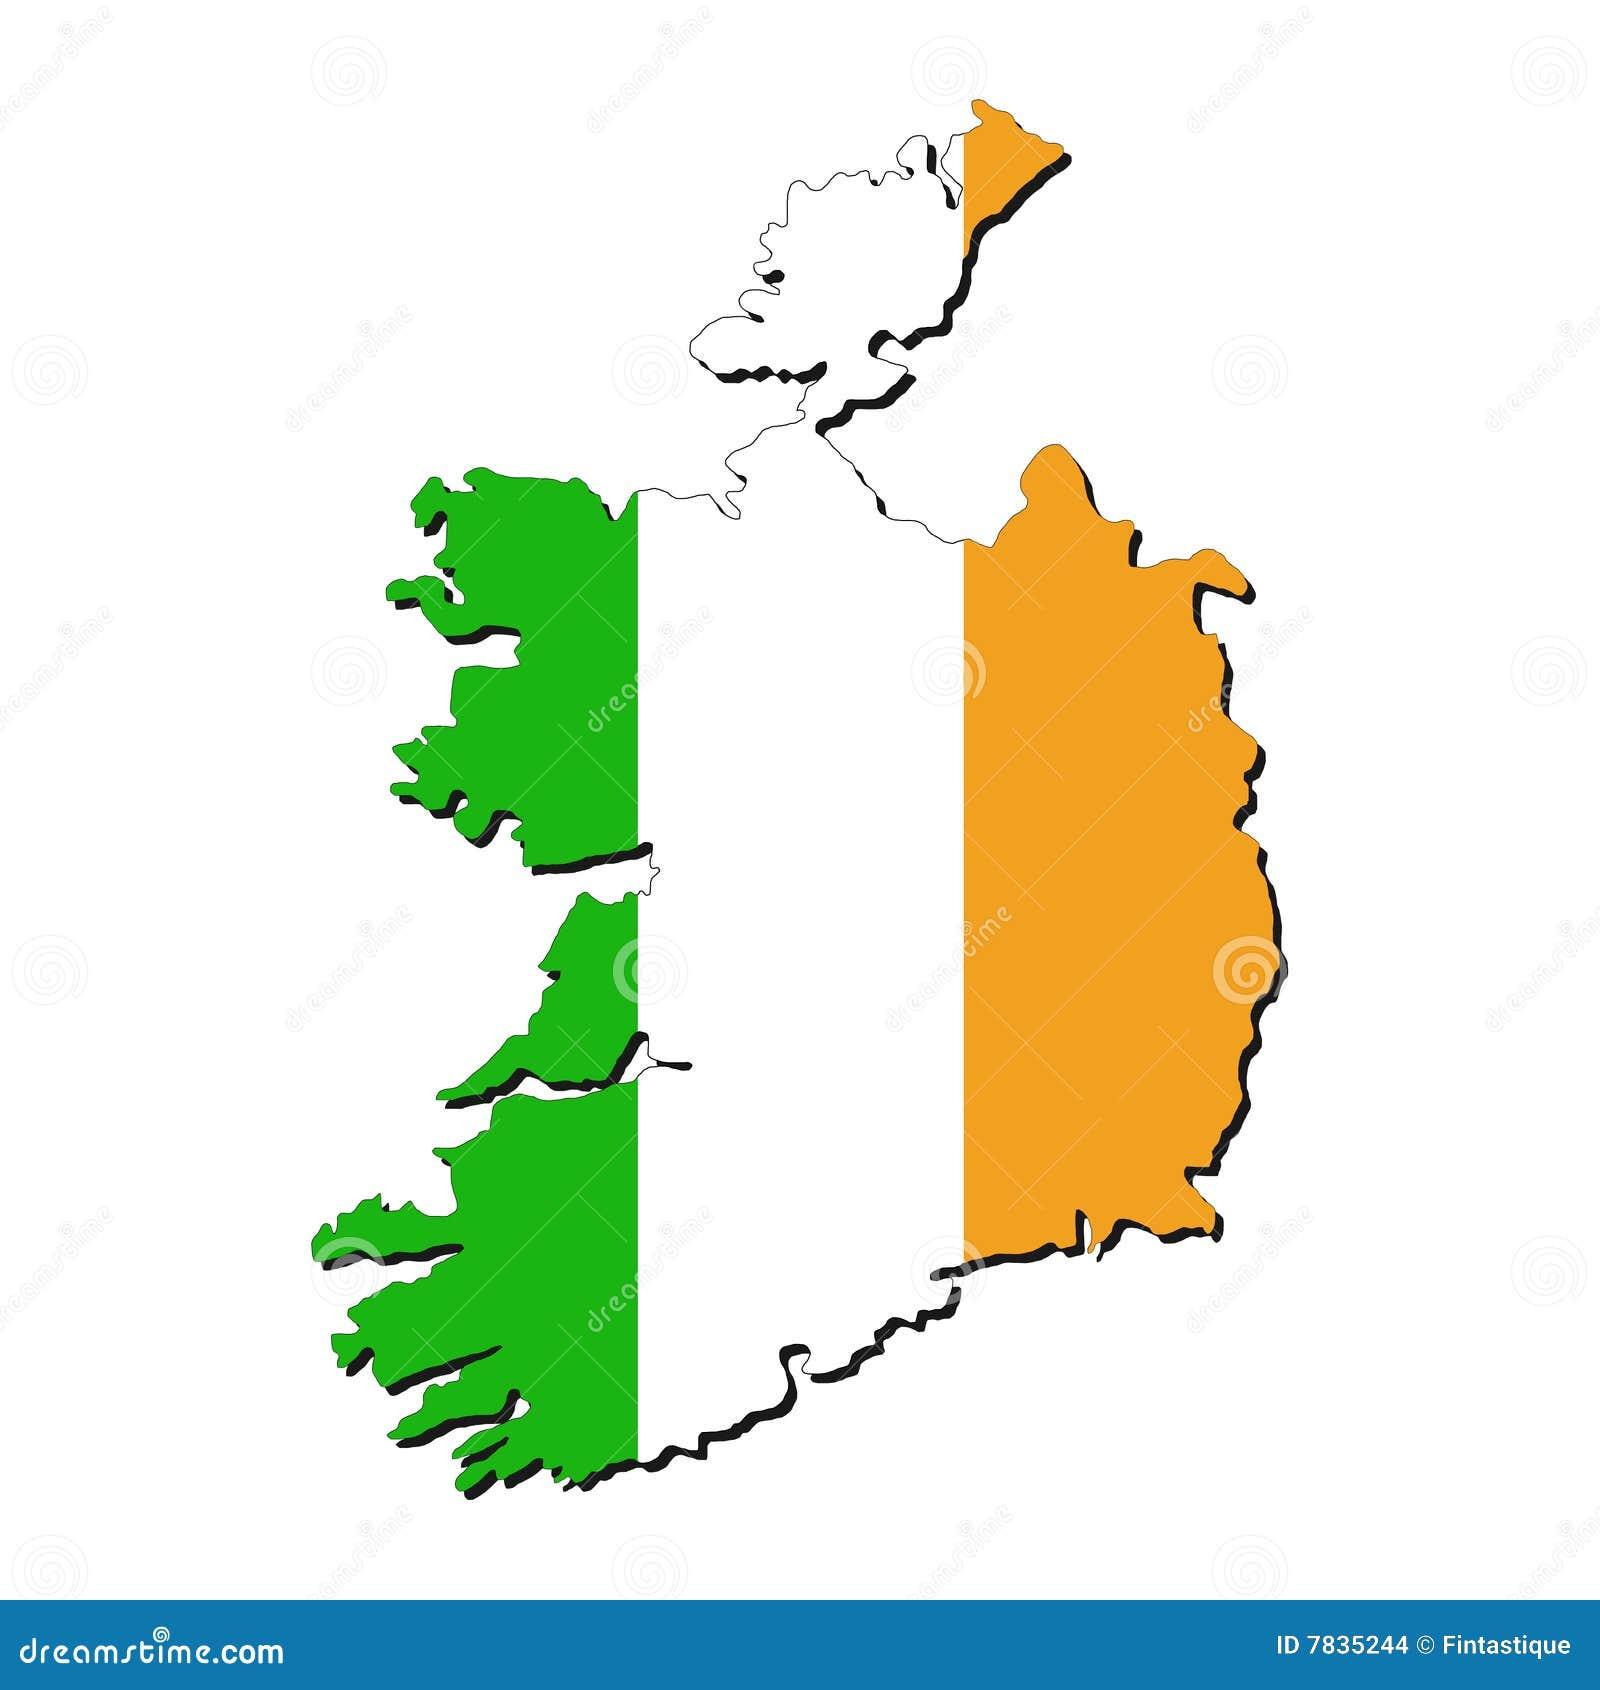 Ireland Map Flag Stock Vector Illustration Of Diagram - Ireland map download